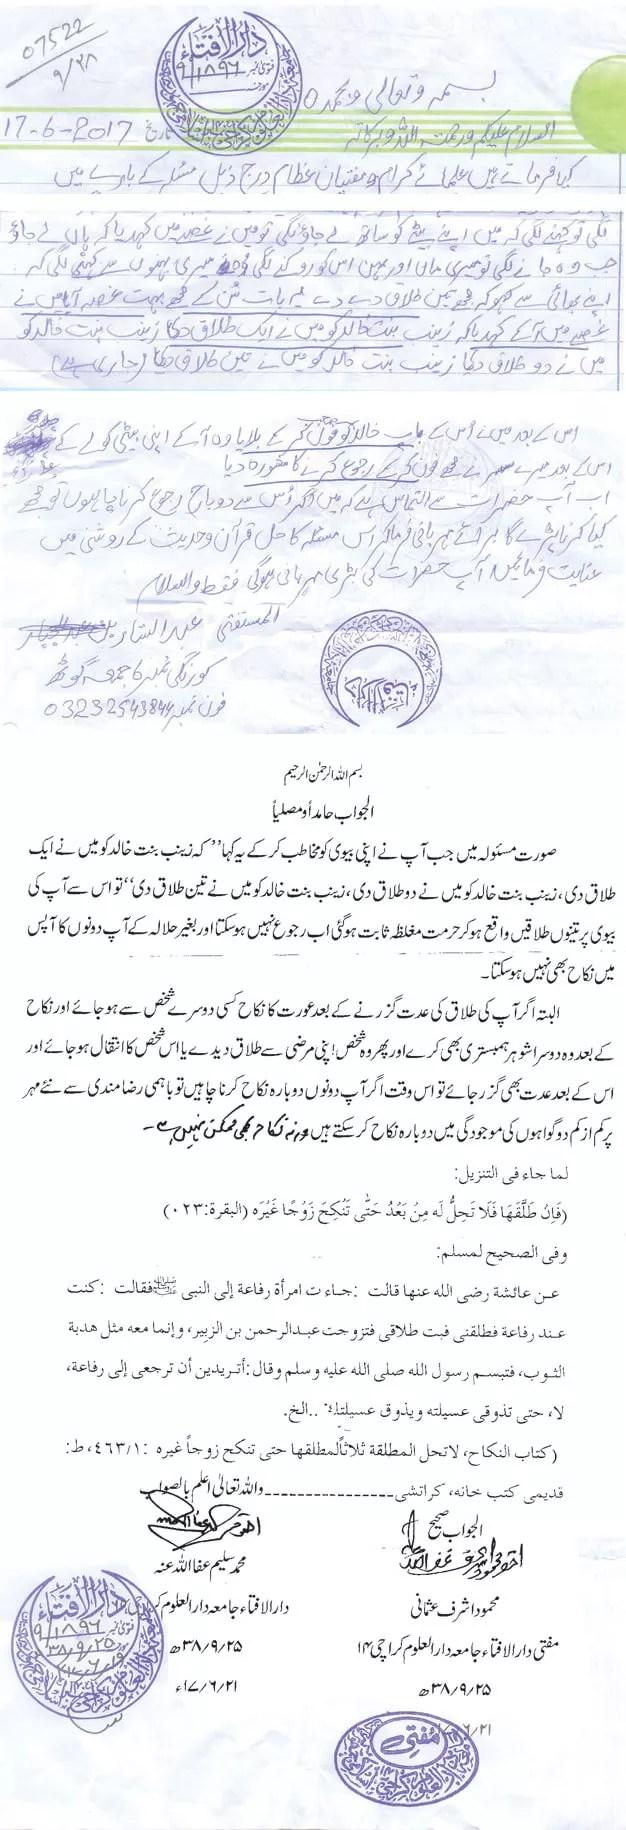 fatwa-Darul-uloom-korangi-karachi-mufti-taqi-usmani